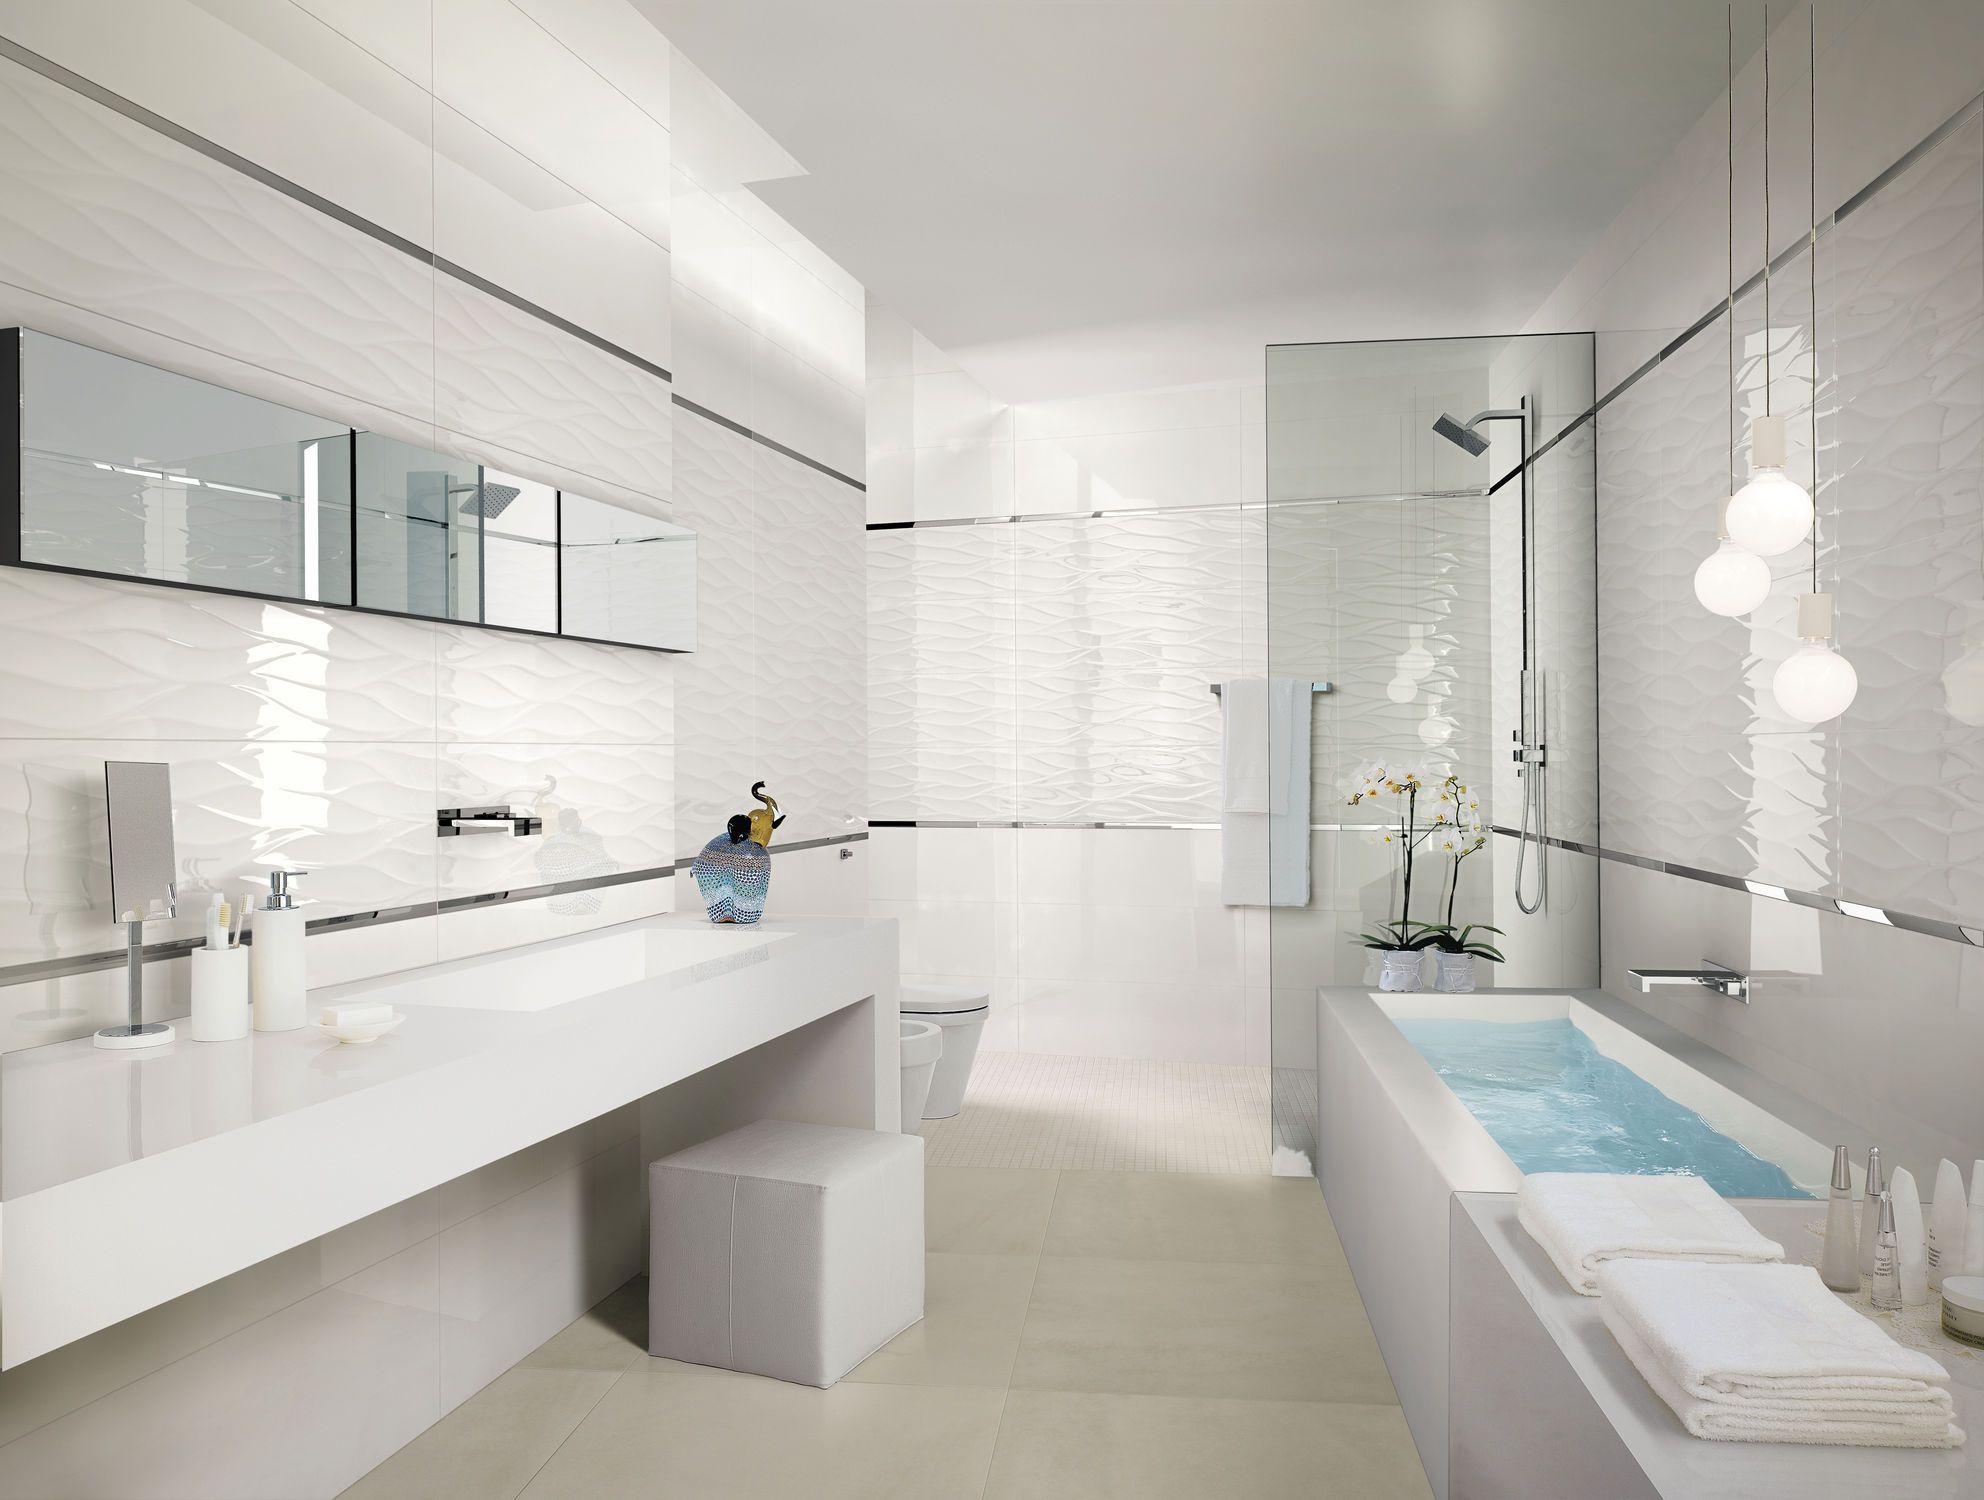 Carrelage de cuisine / de salle de bain / mural / en céramique ...